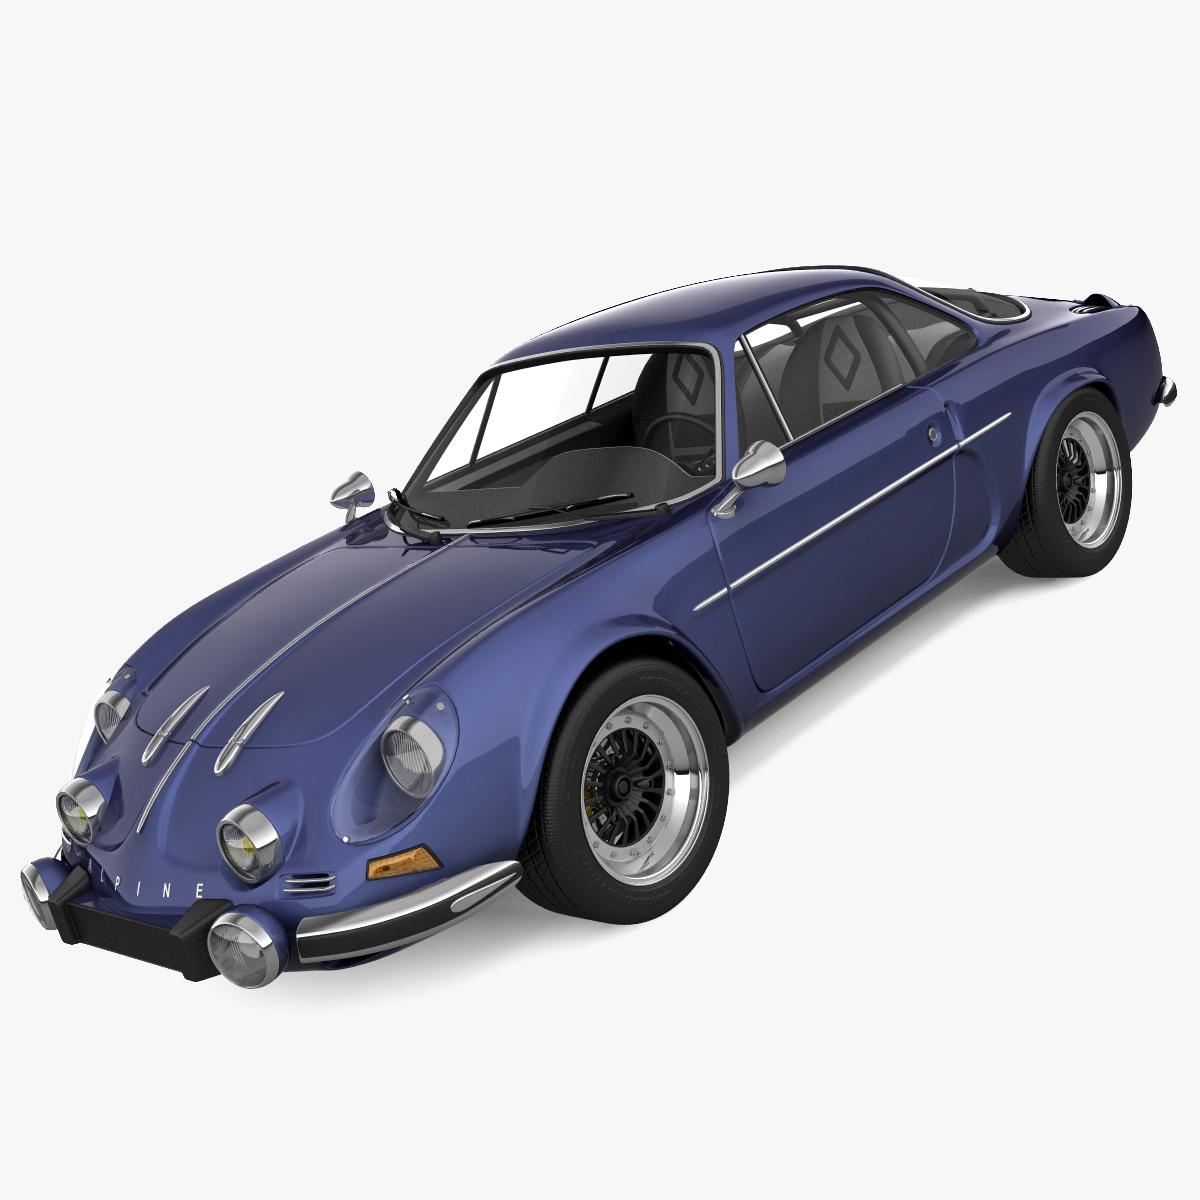 Renault_Alpine_00.jpg